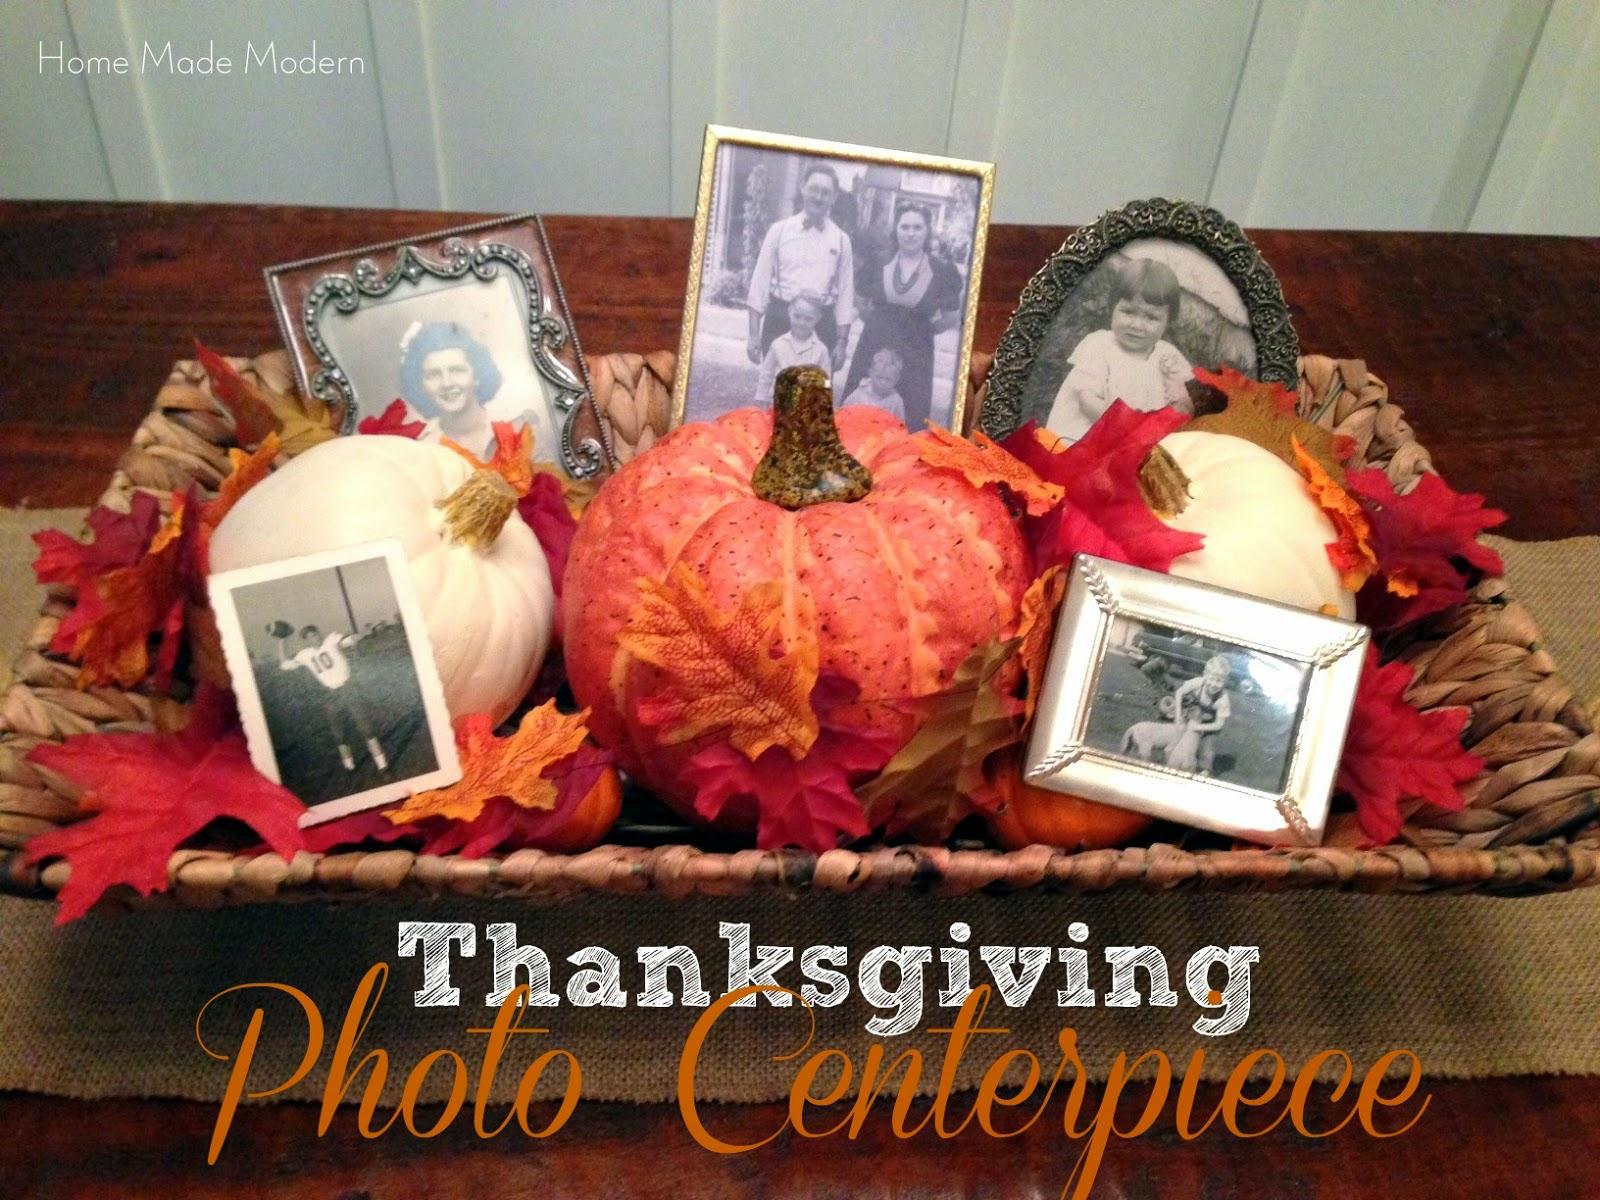 Home made modern centerpiece ideas for thanksgiving for Centerpiece ideas for thanksgiving to make